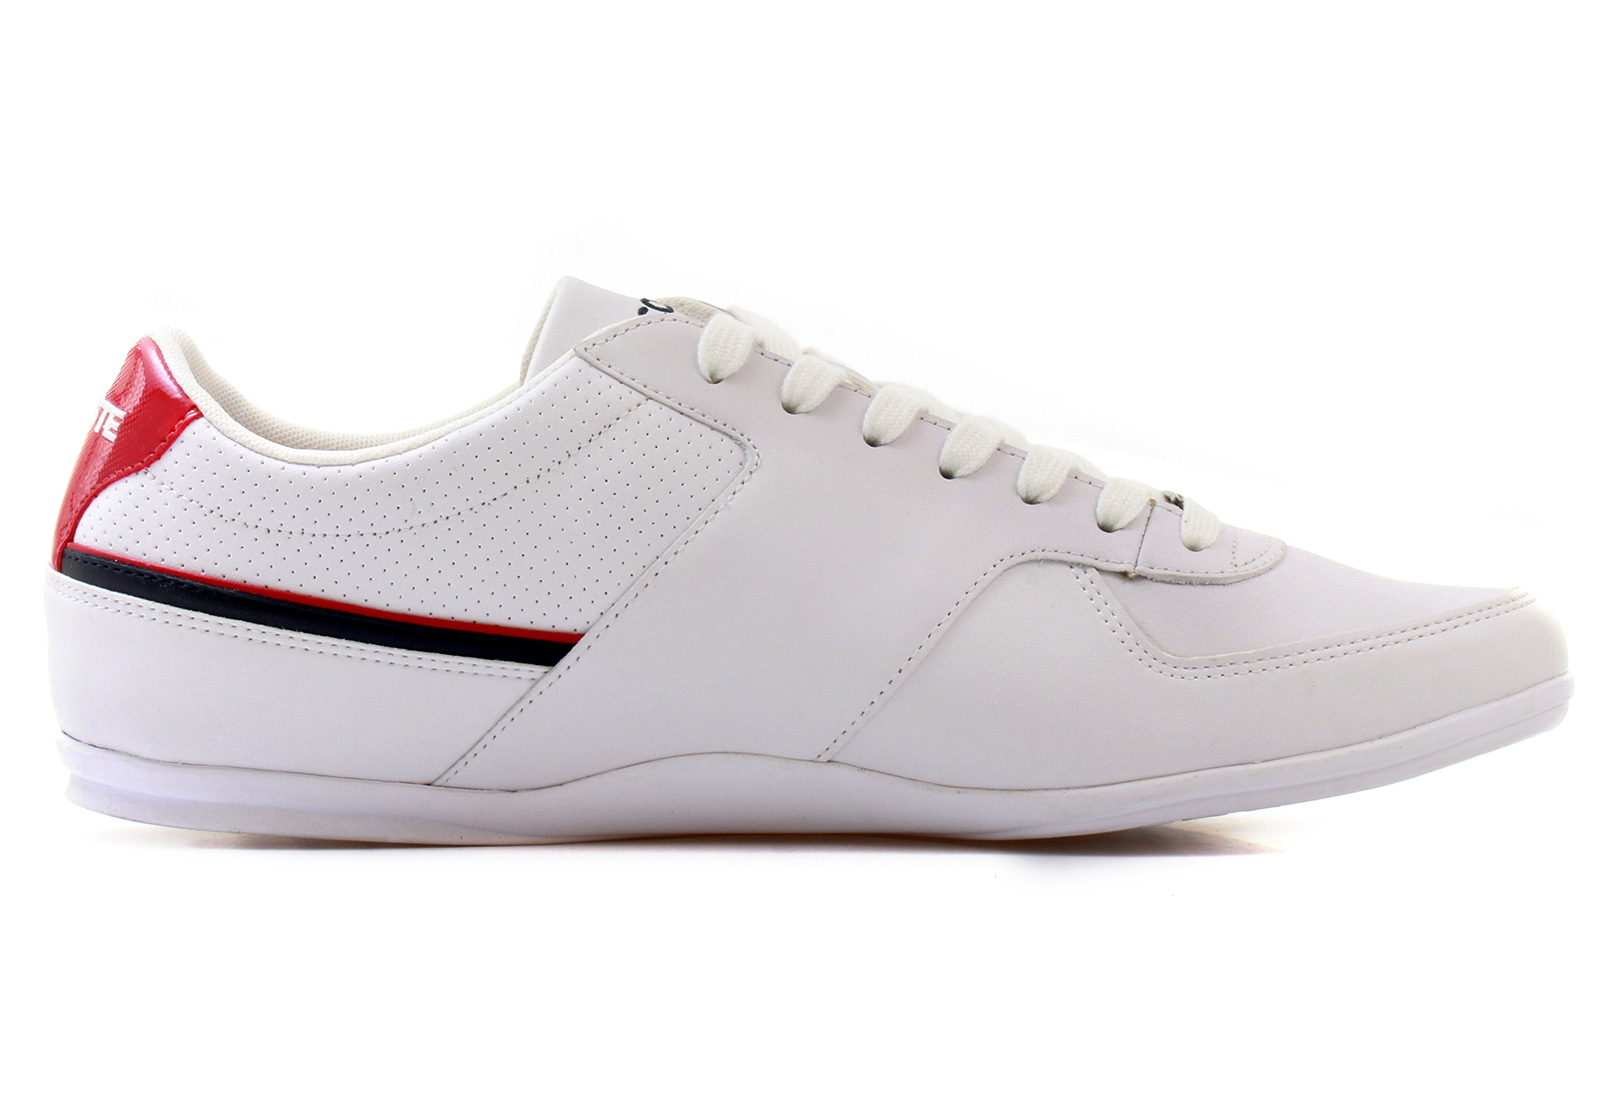 lacoste shoes taloire sport 141spm1093 1y8